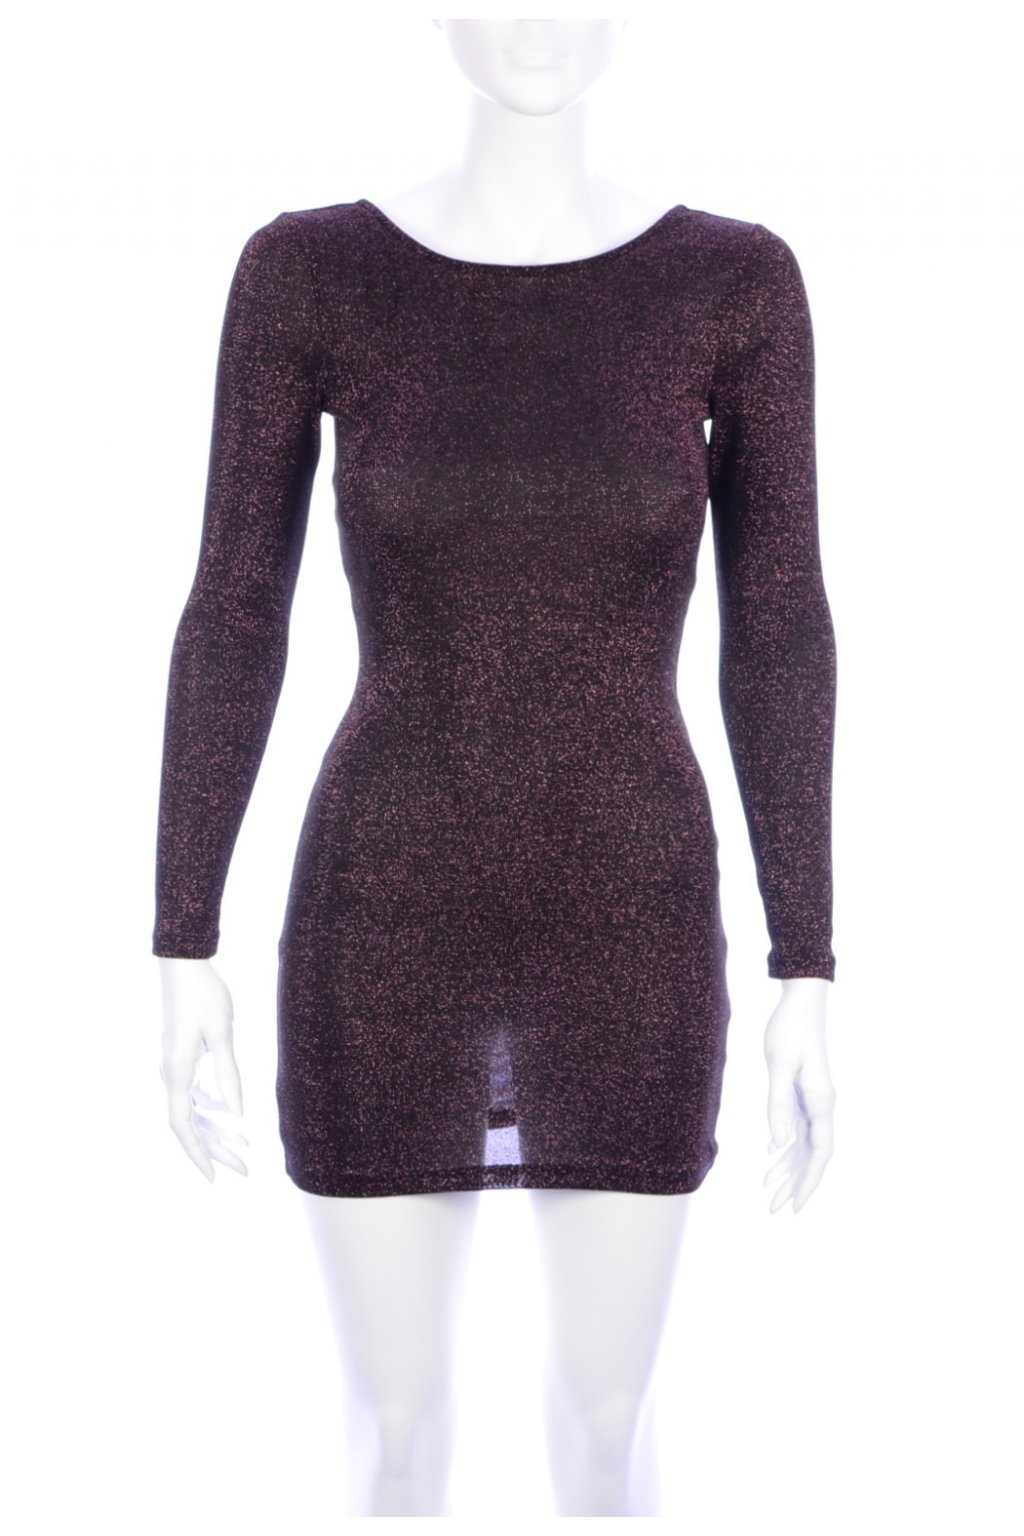 Šaty H&M třpytivé vel. 32 / XXS - XS